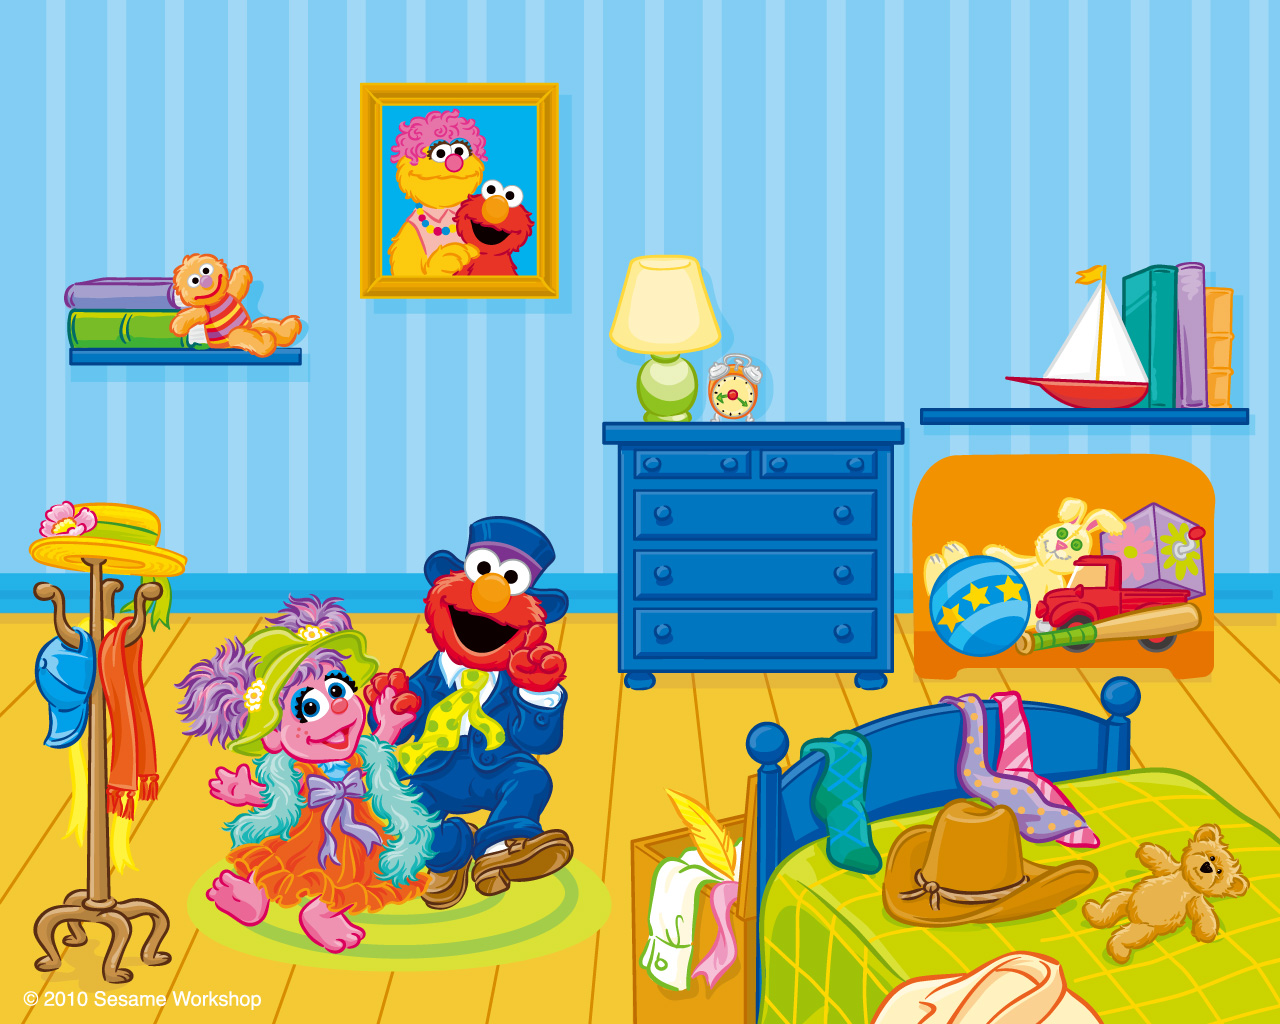 Free Download 1280x1024 For Your Desktop Mobile Tablet Explore 49 Sesame Street Fun Wallpaper Elmo Wallpaper Sesame Street Wallpaper Border